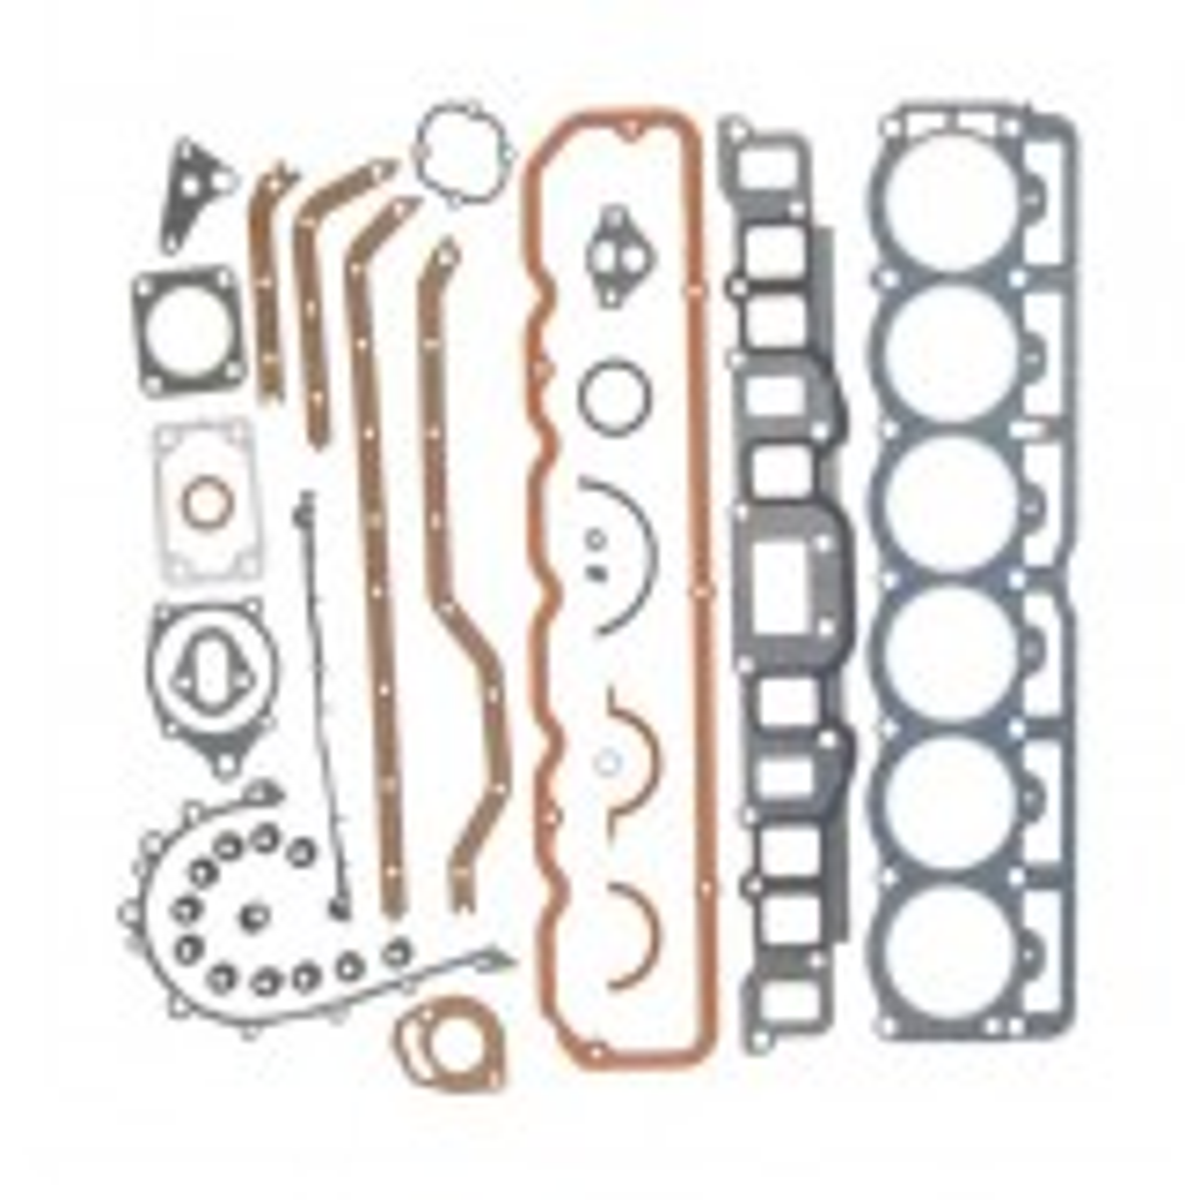 Engine Gasket Set, 4.2L; 81-90 Jeep CJ/Wrangler